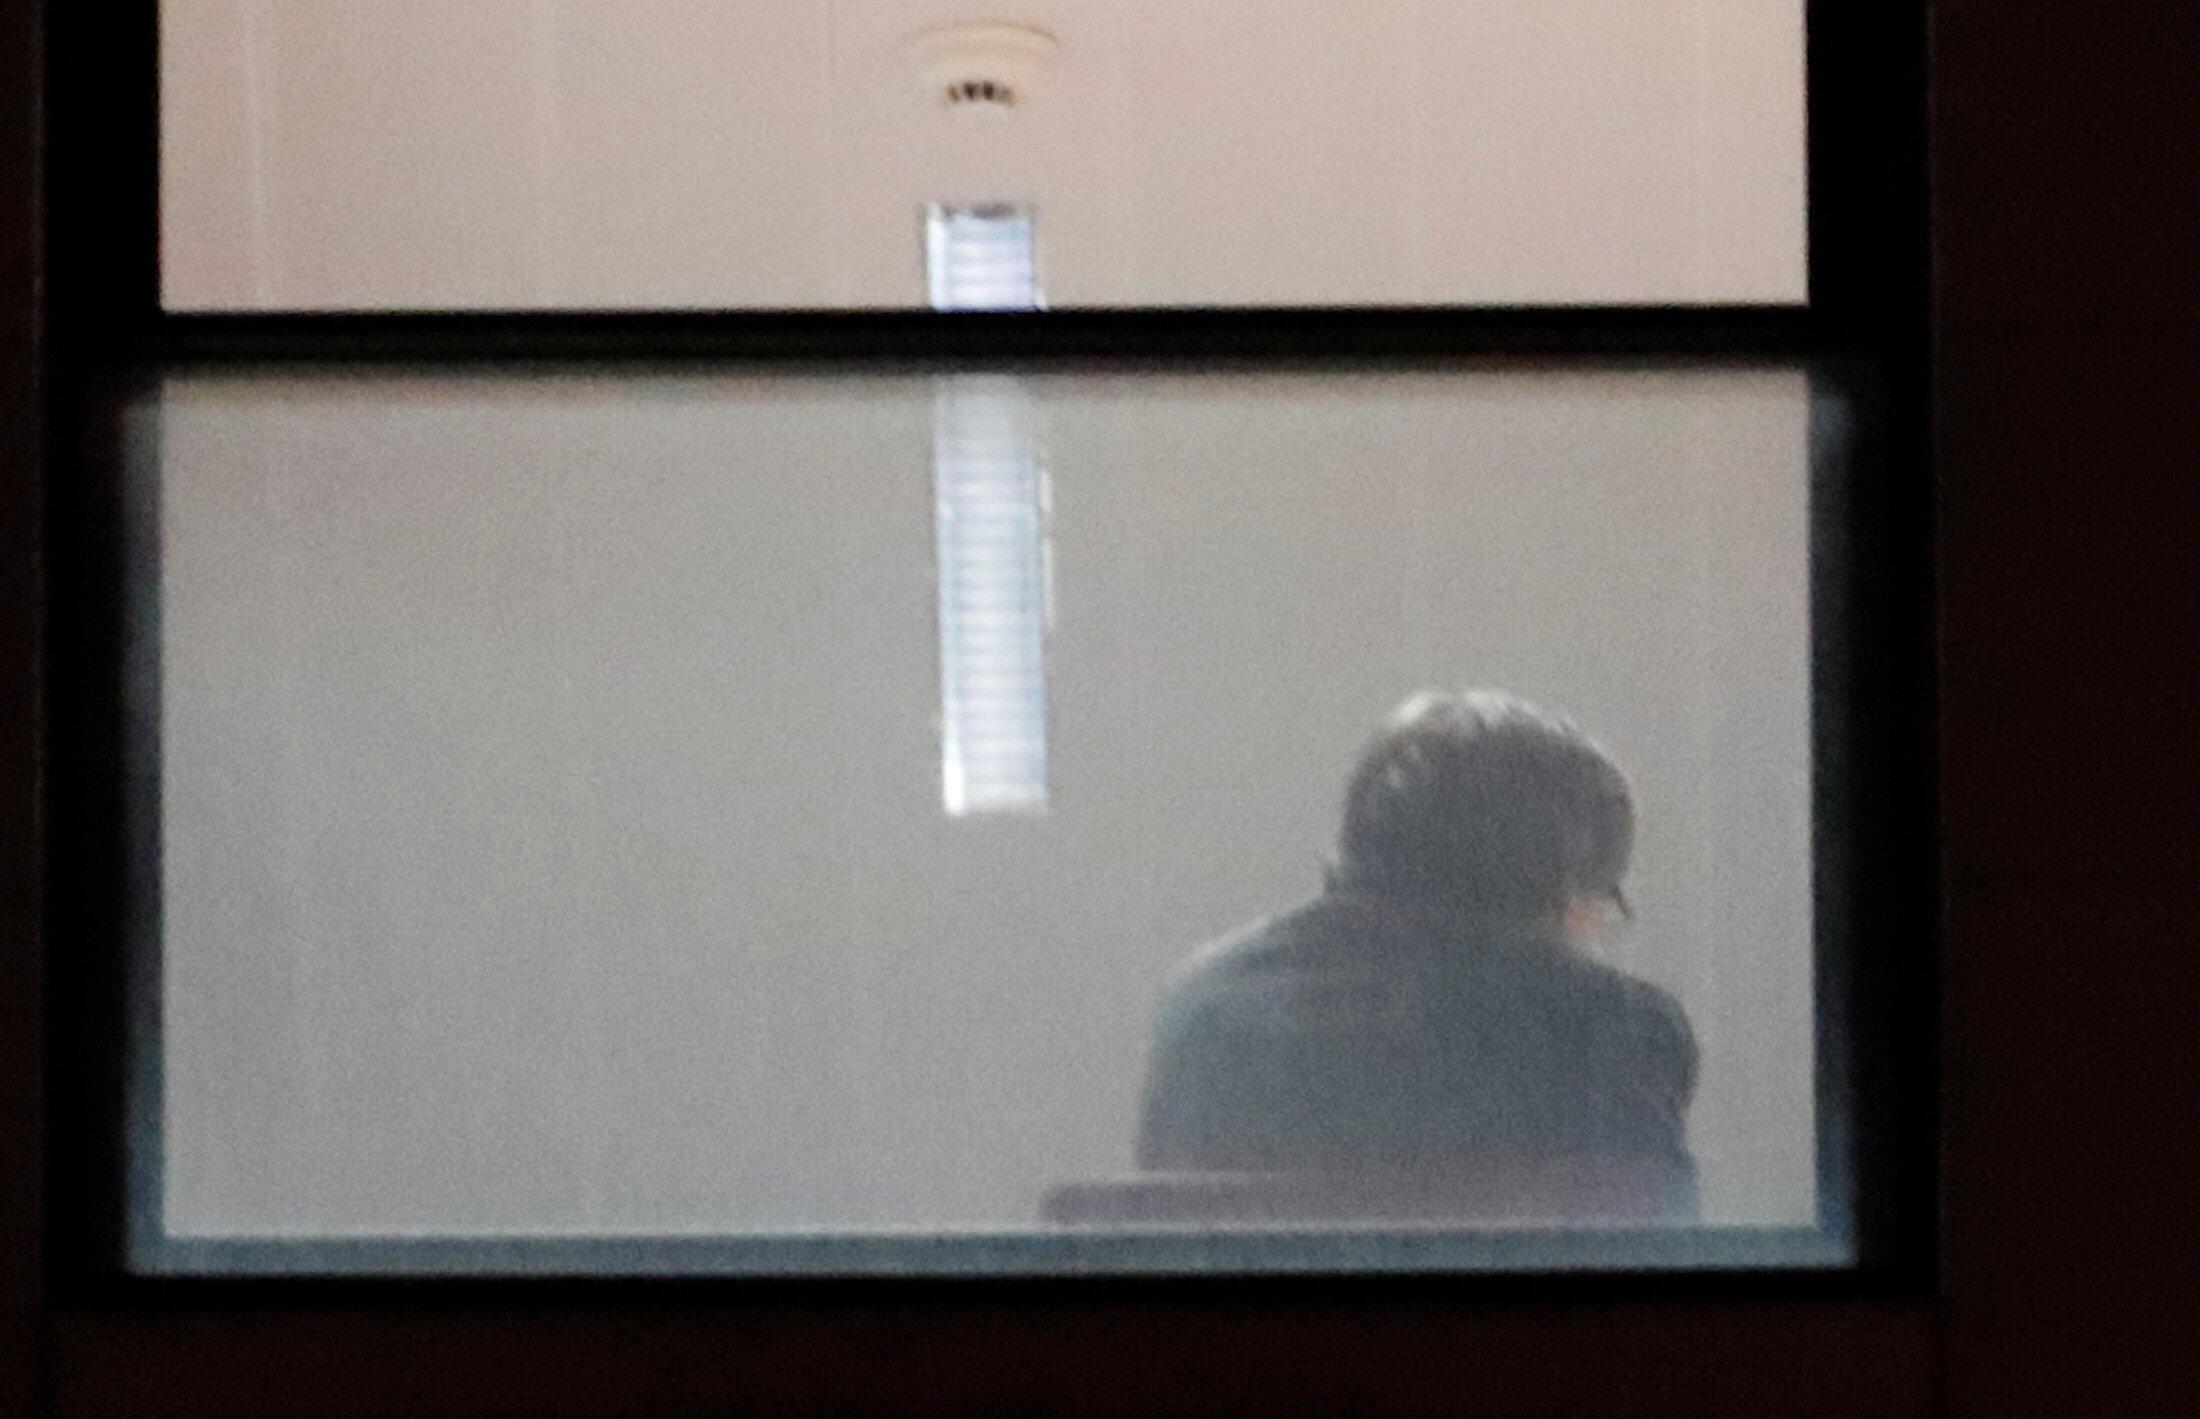 05.11.2017. Брюссель. Карлес Пучдемон в здании прокуратуры